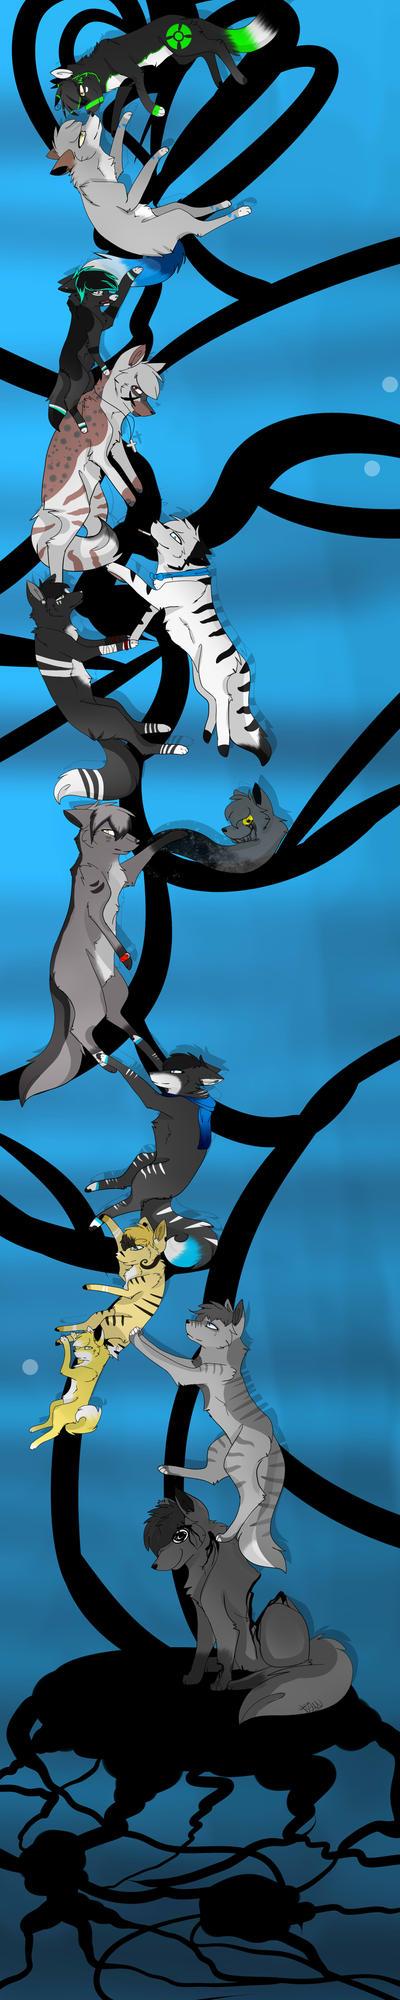 Durarara Trust me OC ending by wolvesforever122